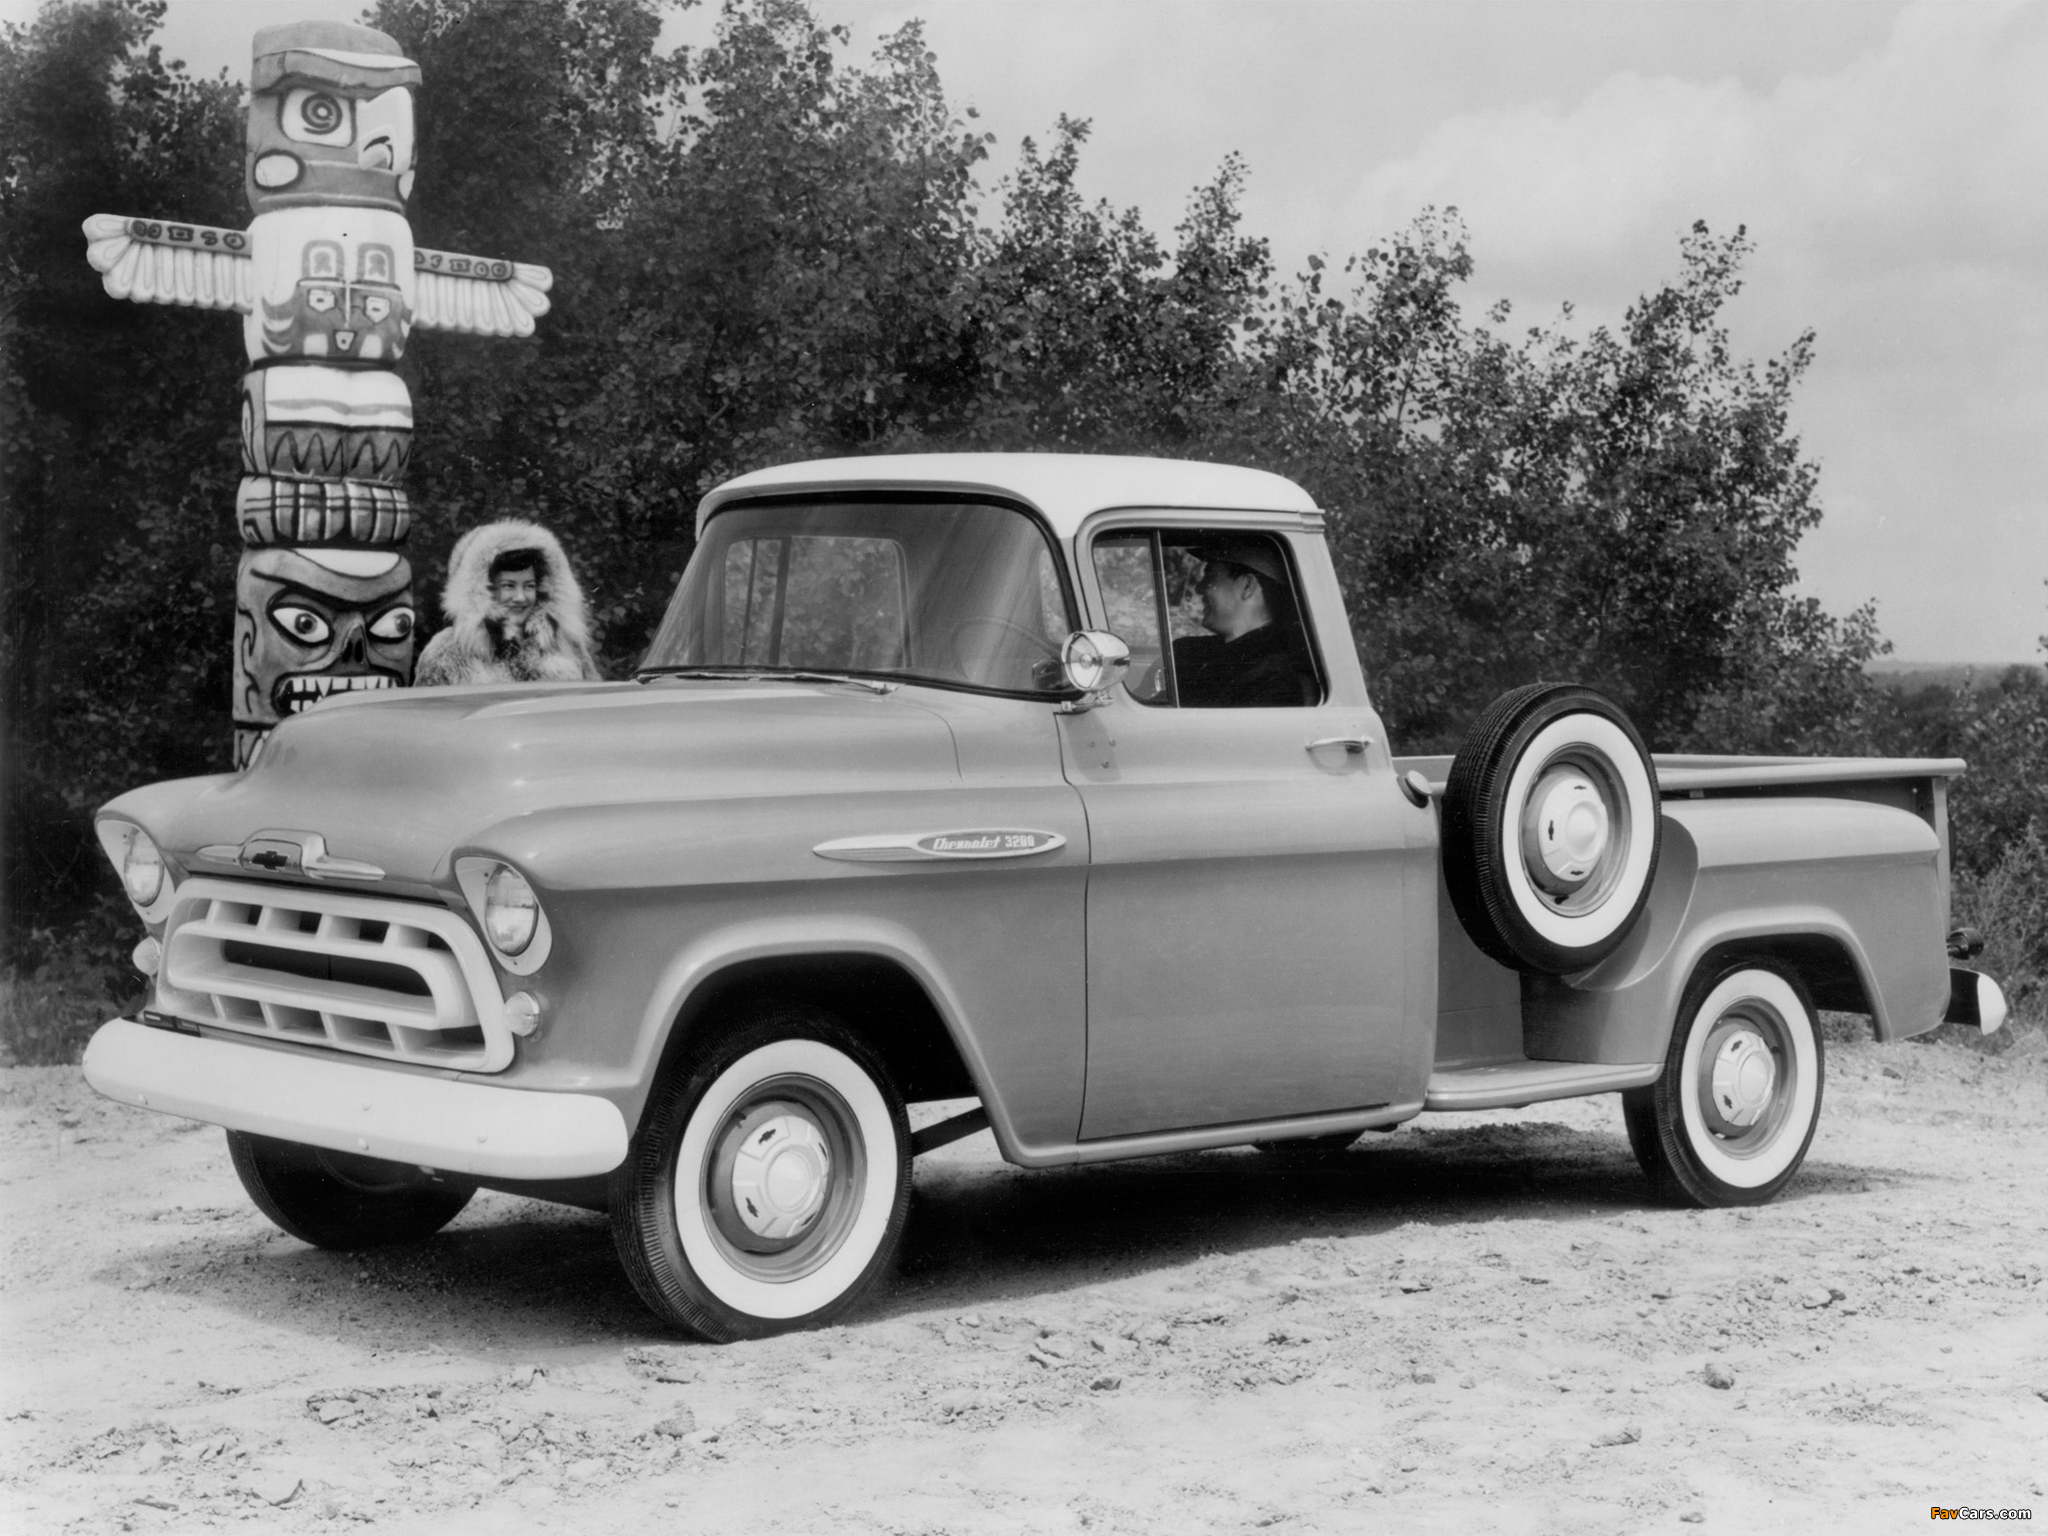 Chevrolet 3200 Stepside Pickup 3b 3204 1957 Images 2048x1536 Chevy C10 2048 X 1536